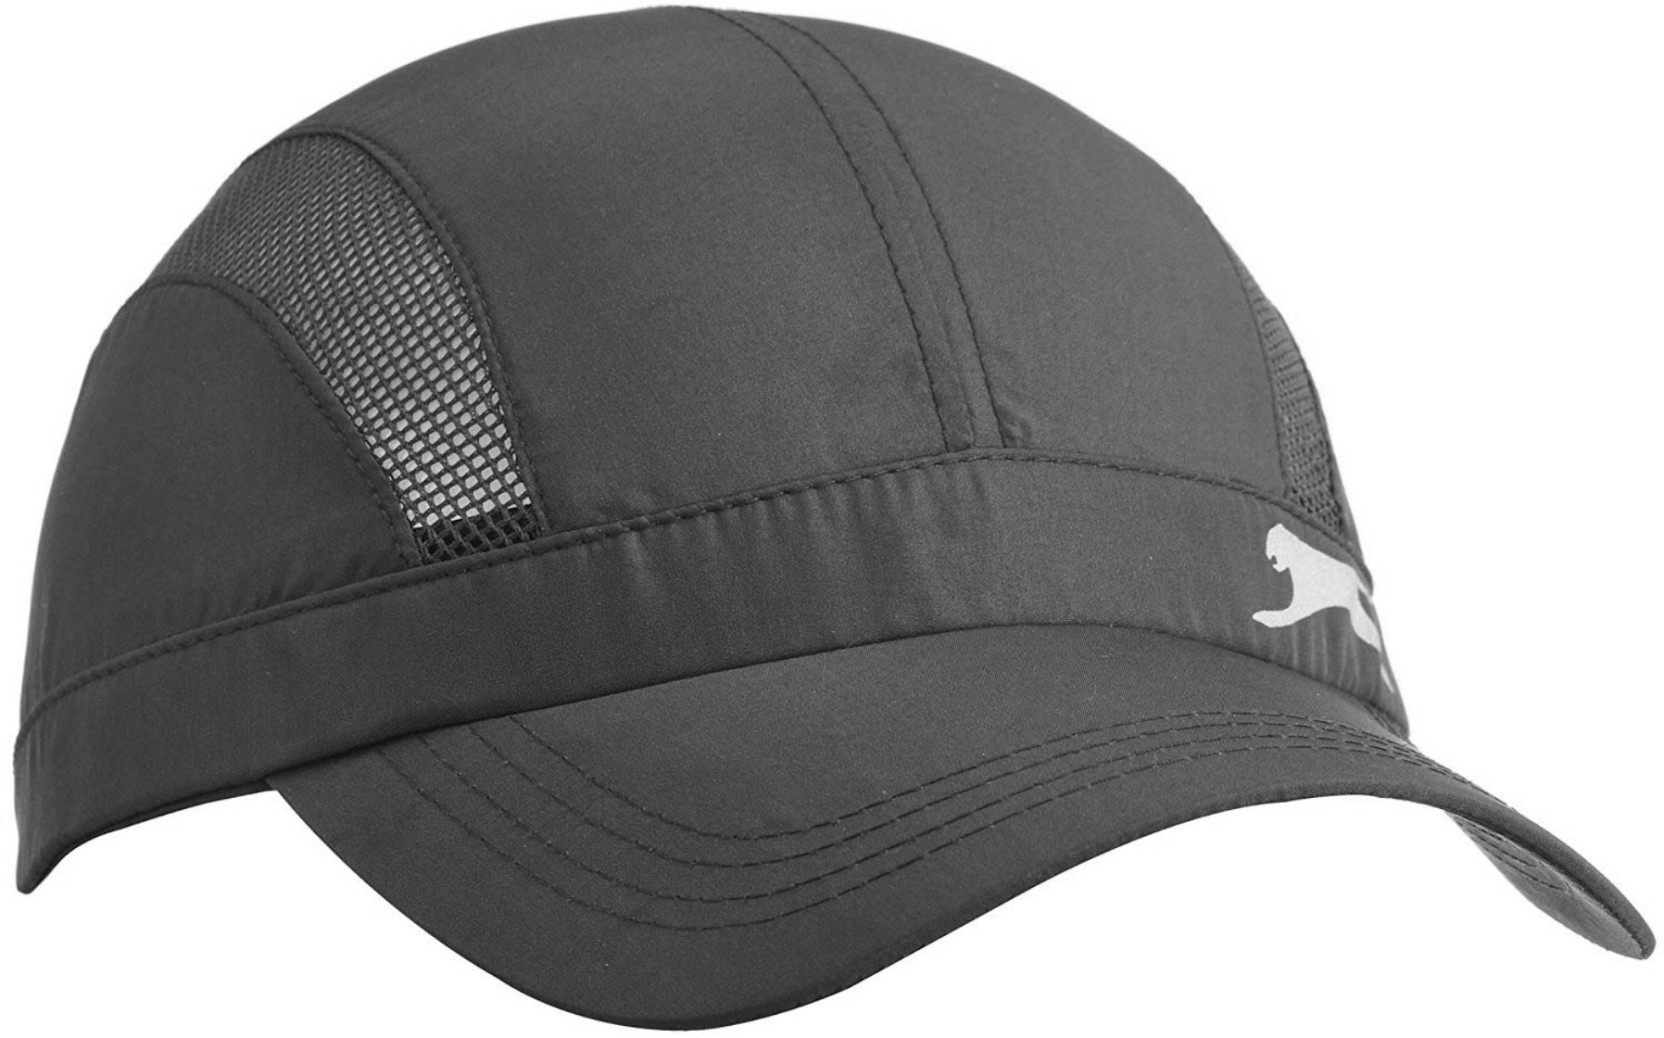 Slazenger Solid Snapback Cap Buy Black 1084 Trolley Case 28 Inc Home